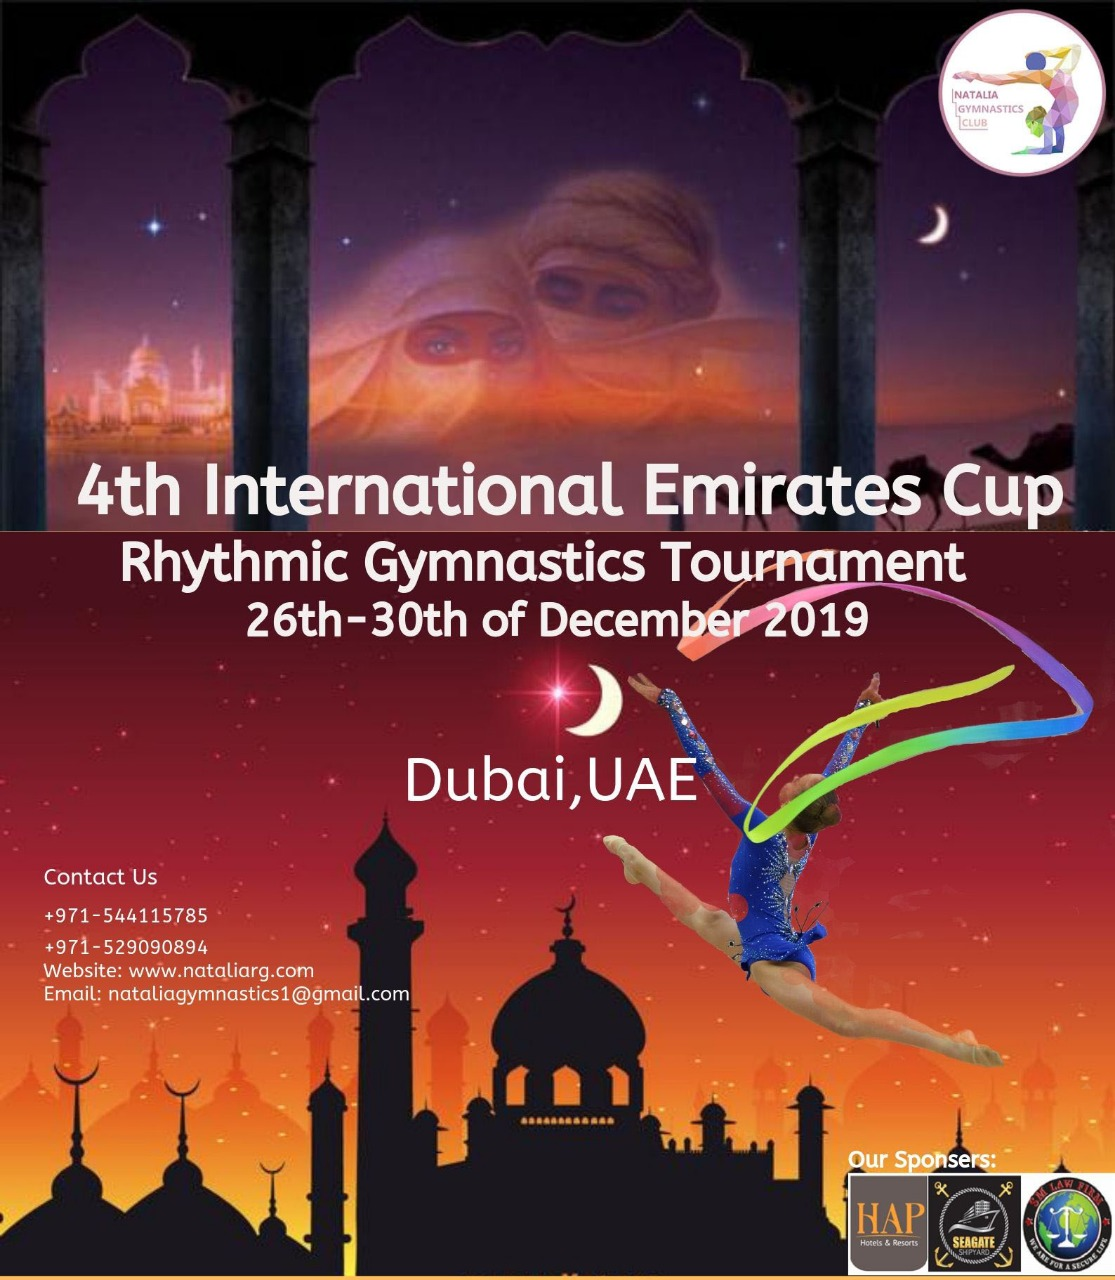 «4th INTERNATIONAL EMIRATES CUP 2019», 26-30.12.2019, DUBAI, UAE